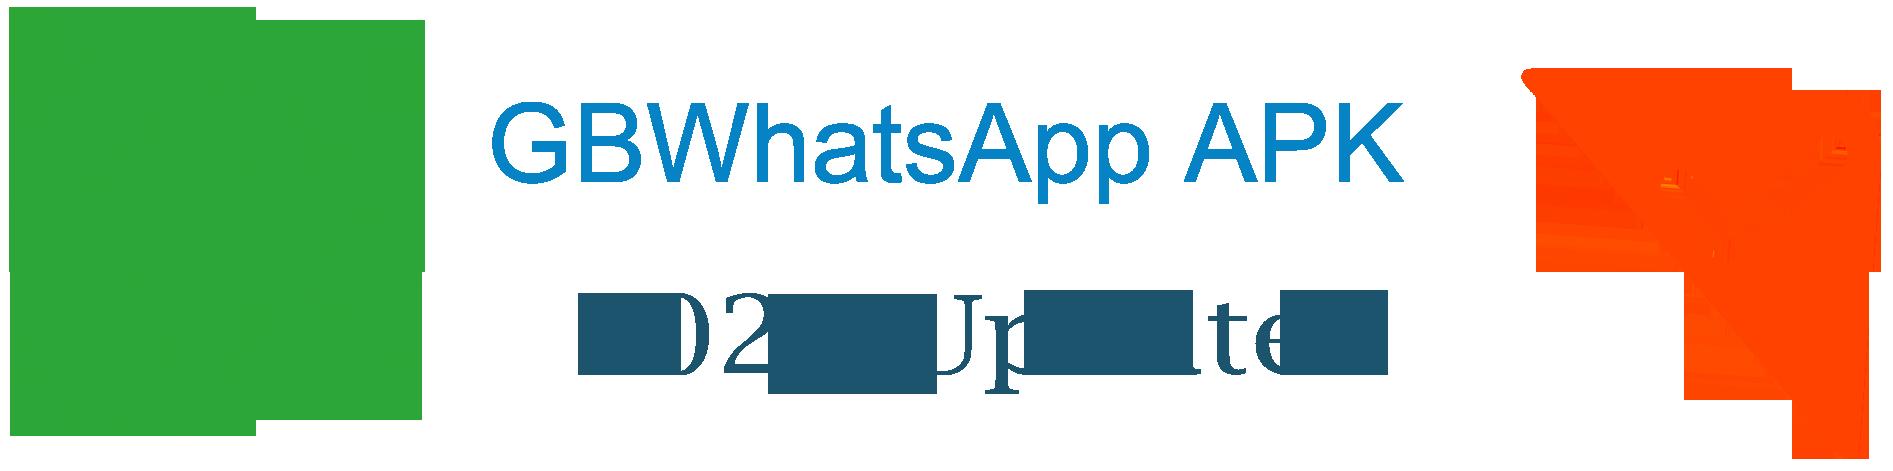 GBwhatsapp 2021